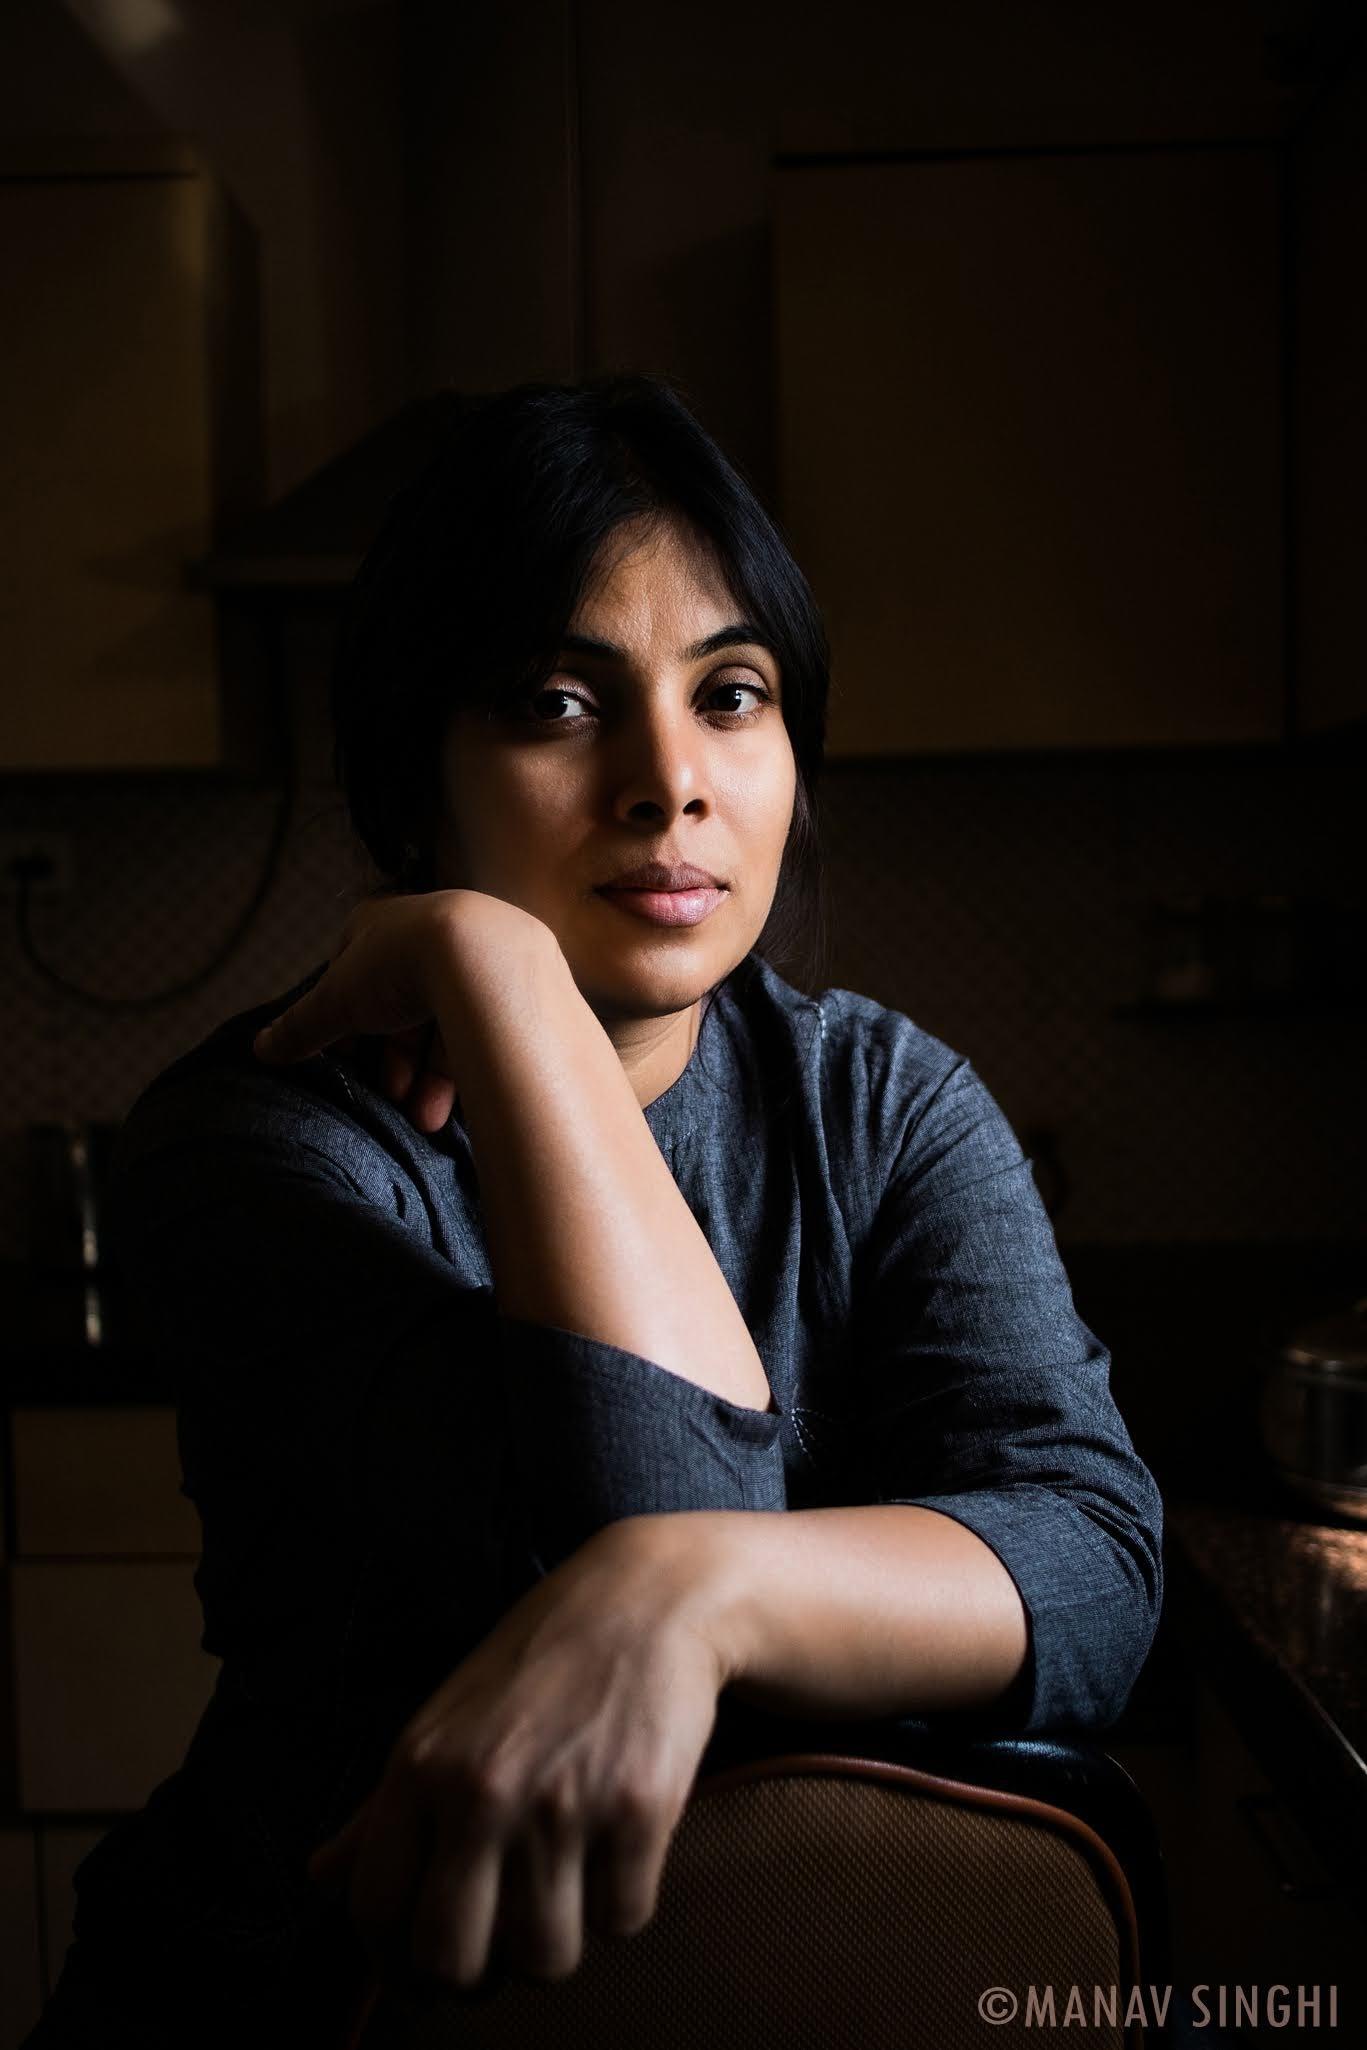 Portrait of My Wife #LockDown Stories.